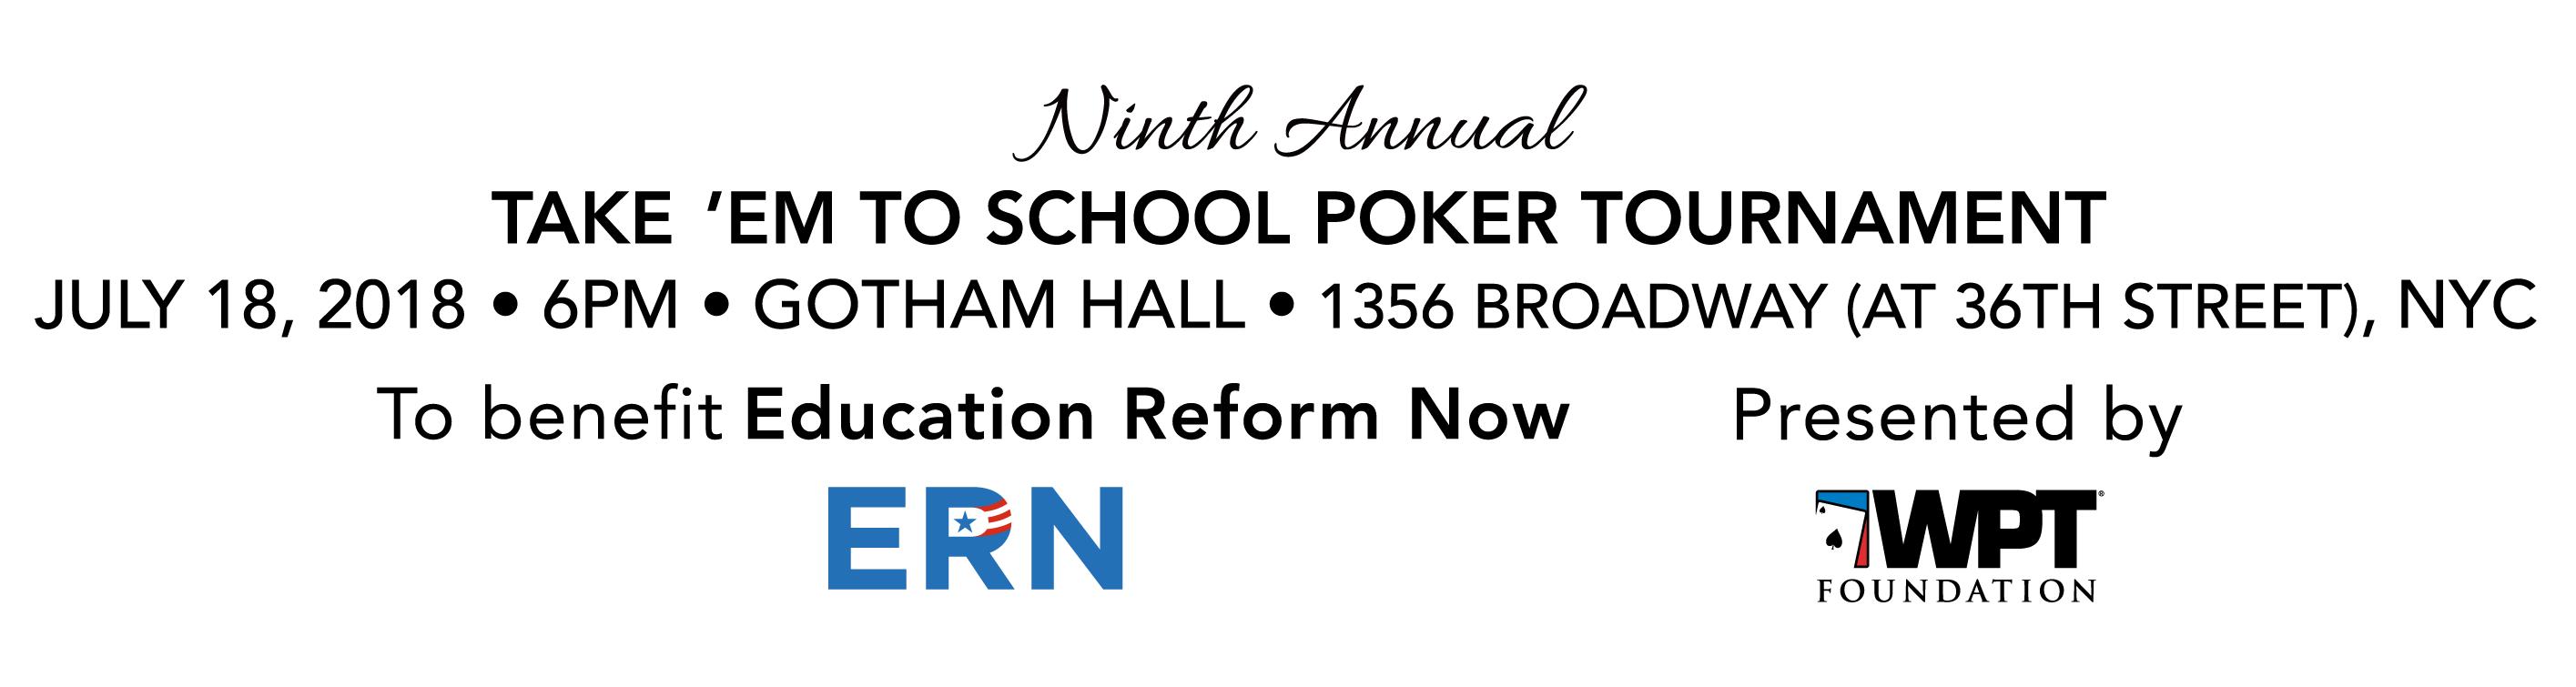 ERN Take 'Em to School Poker Tournament 2019